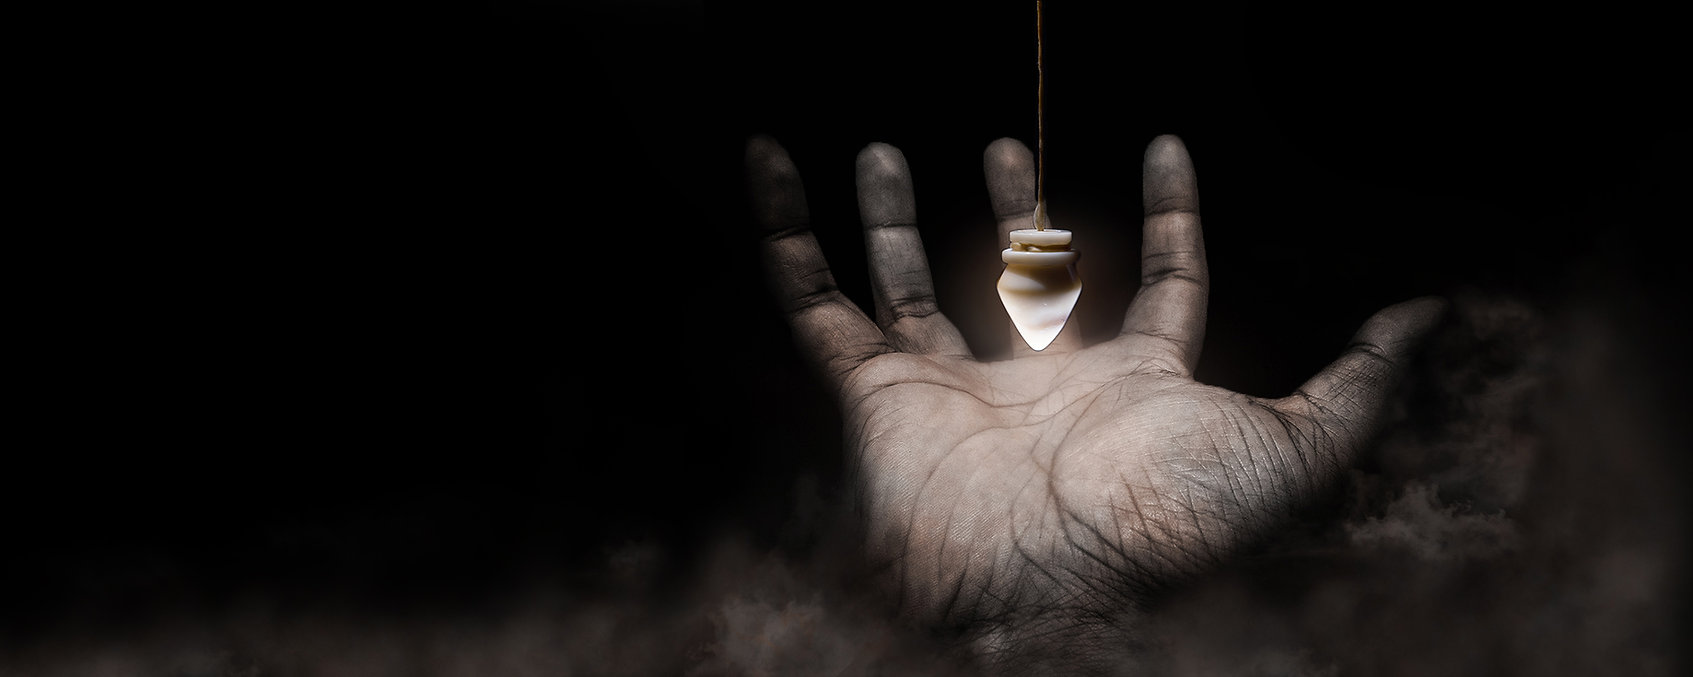 Pendulum Over Hand - Wide.jpg